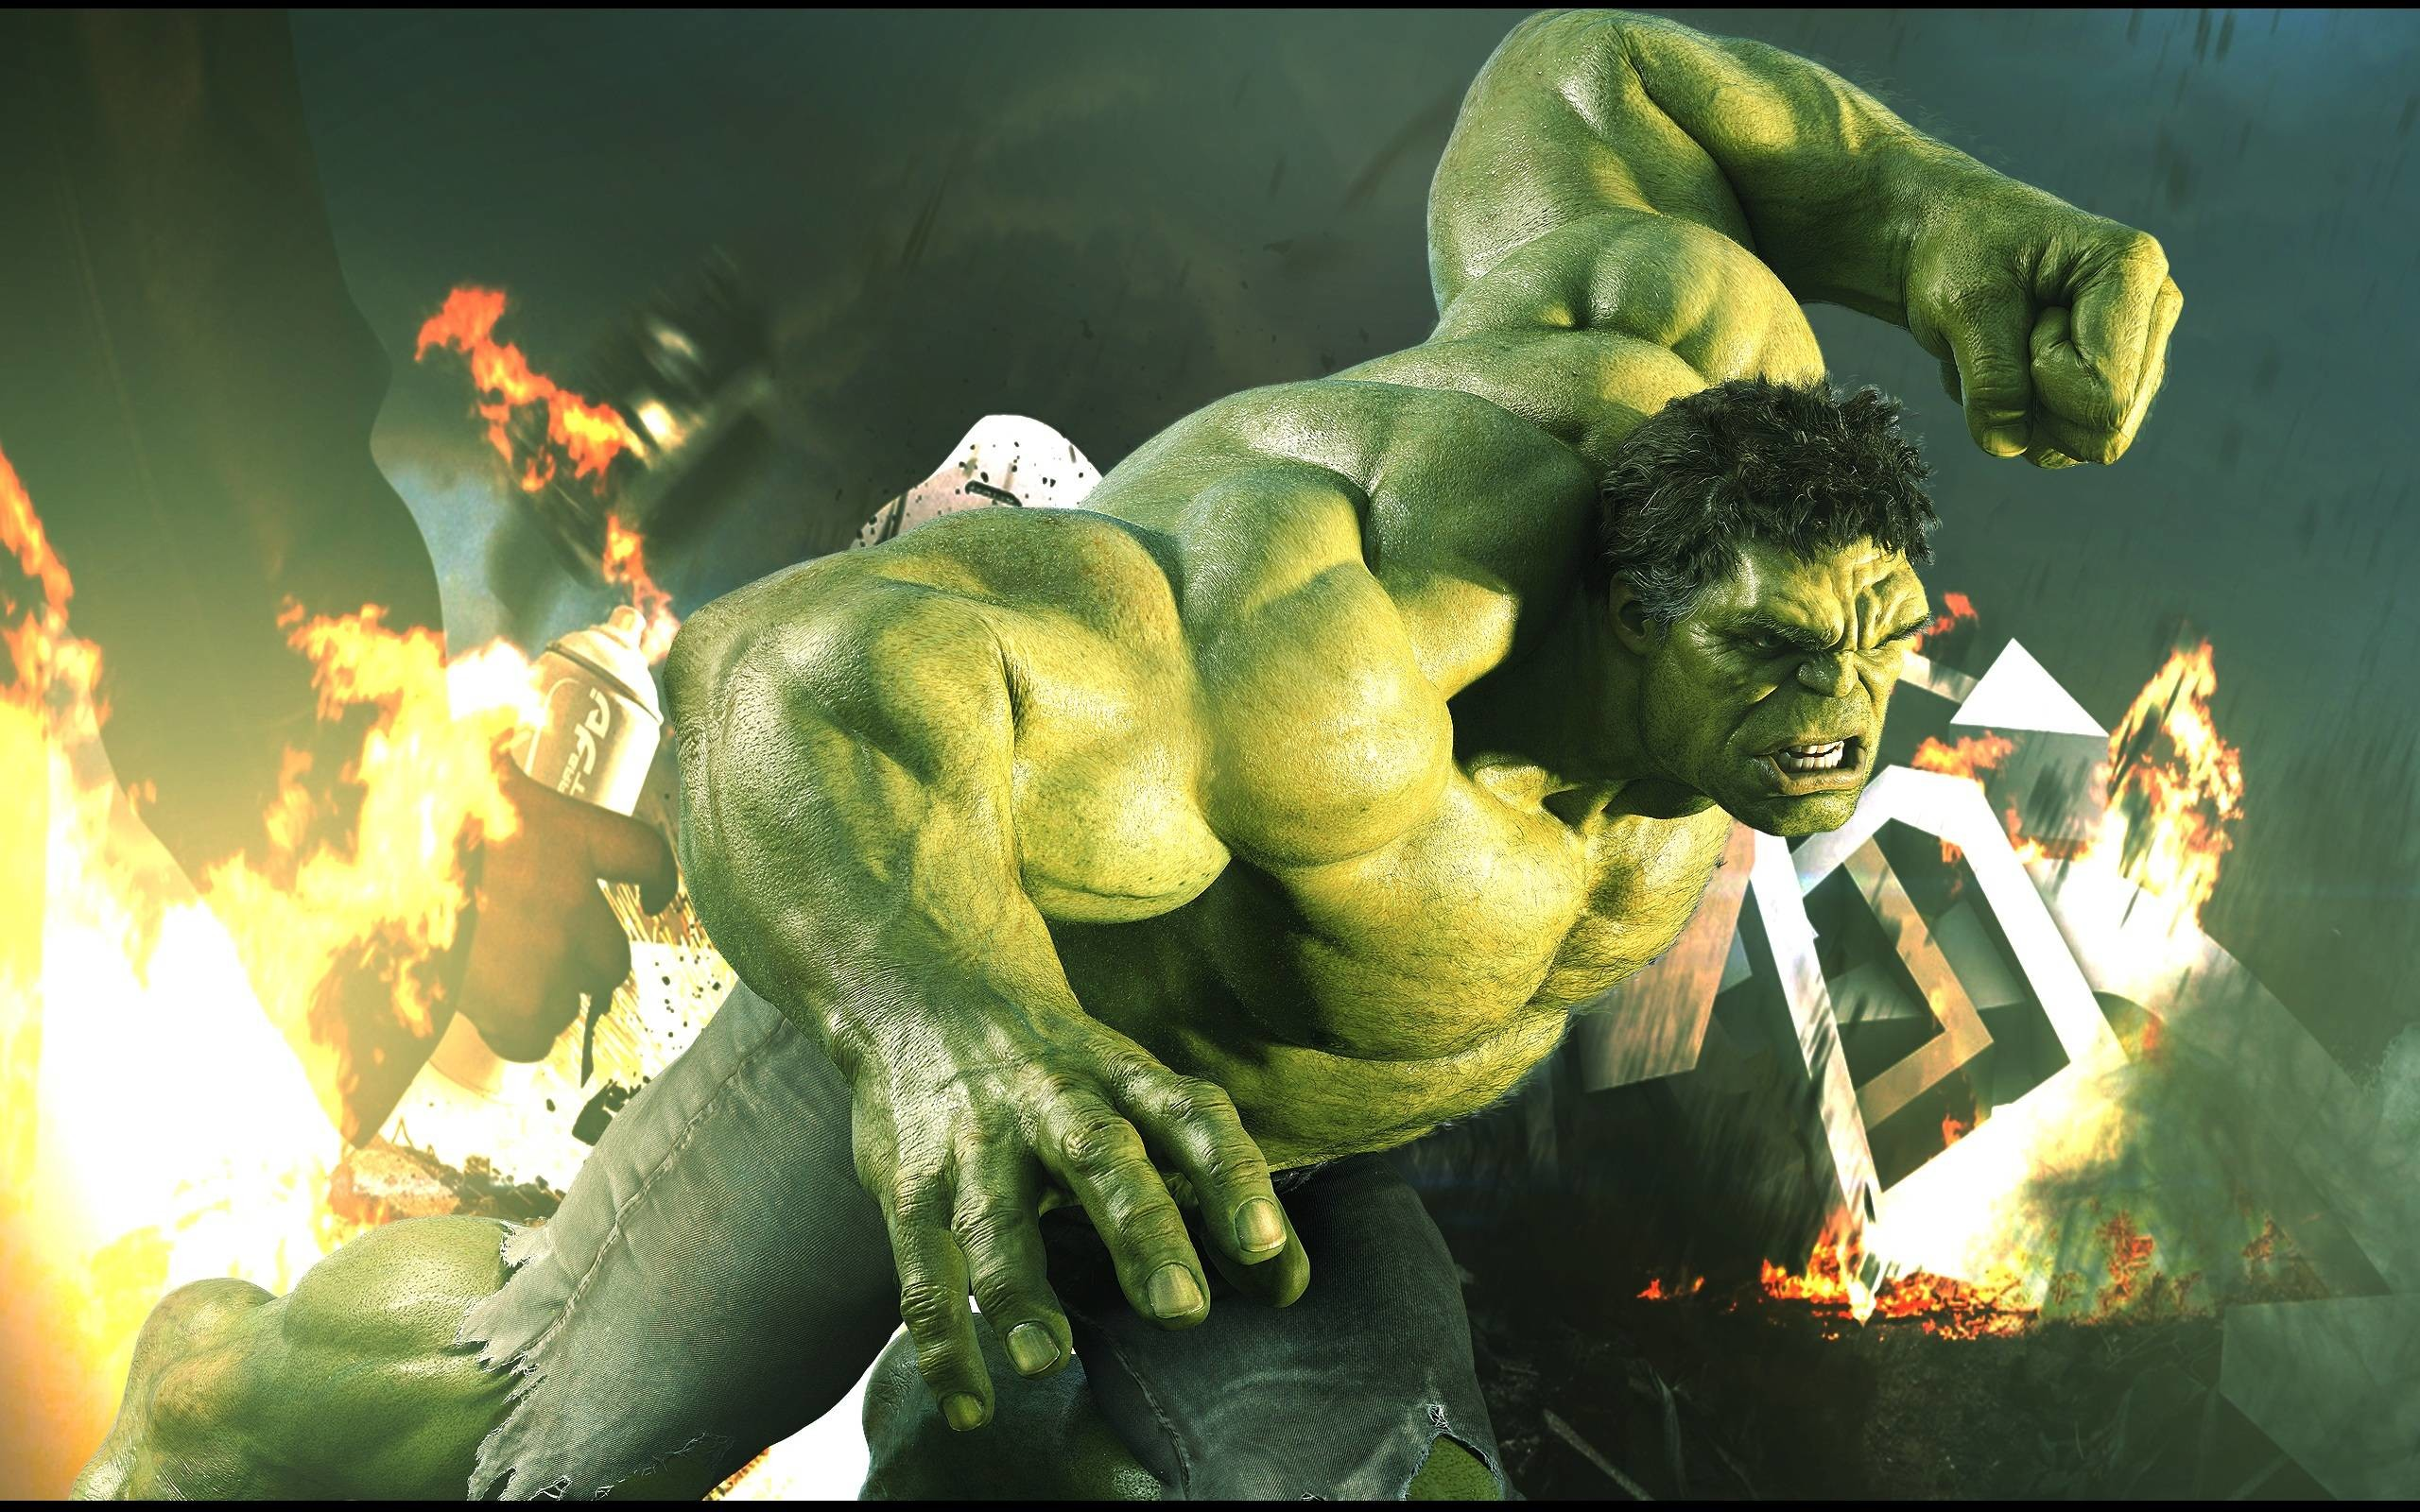 2560x1600 Incredible Hulk Wallpapers HD By Elizabeth Chamberlain 13 Download Comics